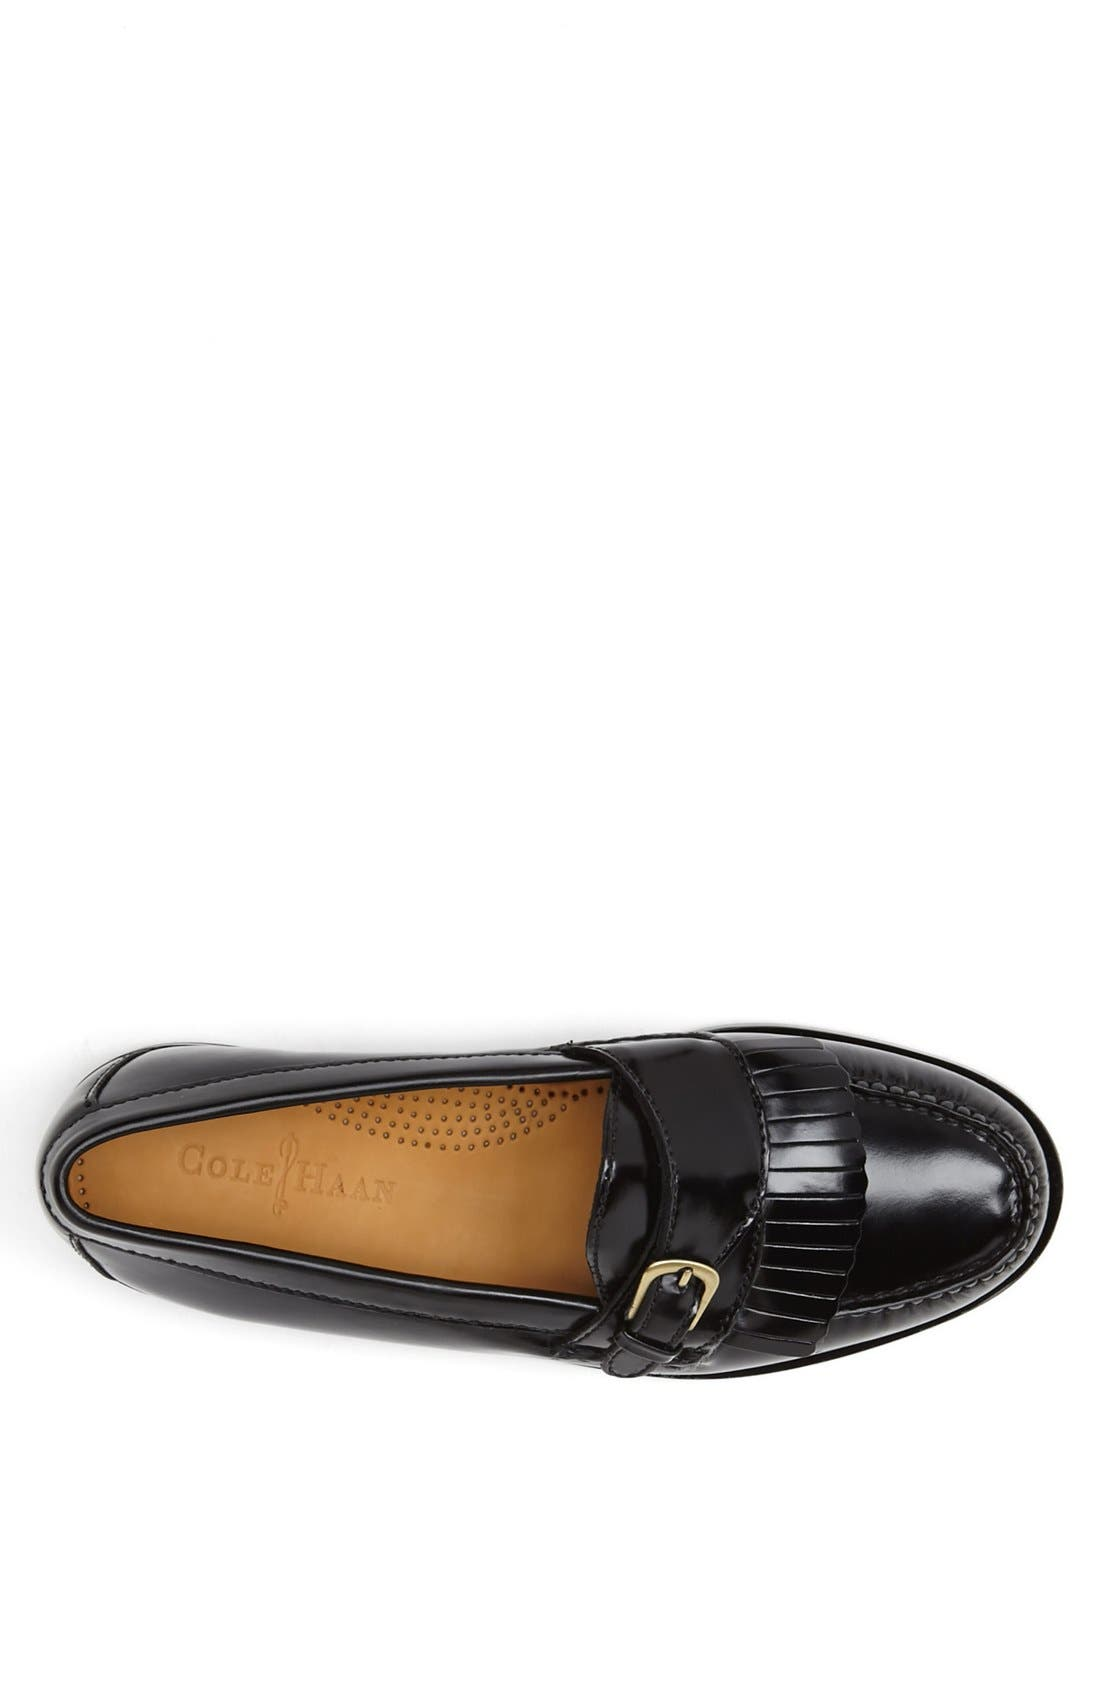 Alternate Image 3  - Cole Haan 'Pinch Buckle' Loafer   (Men)